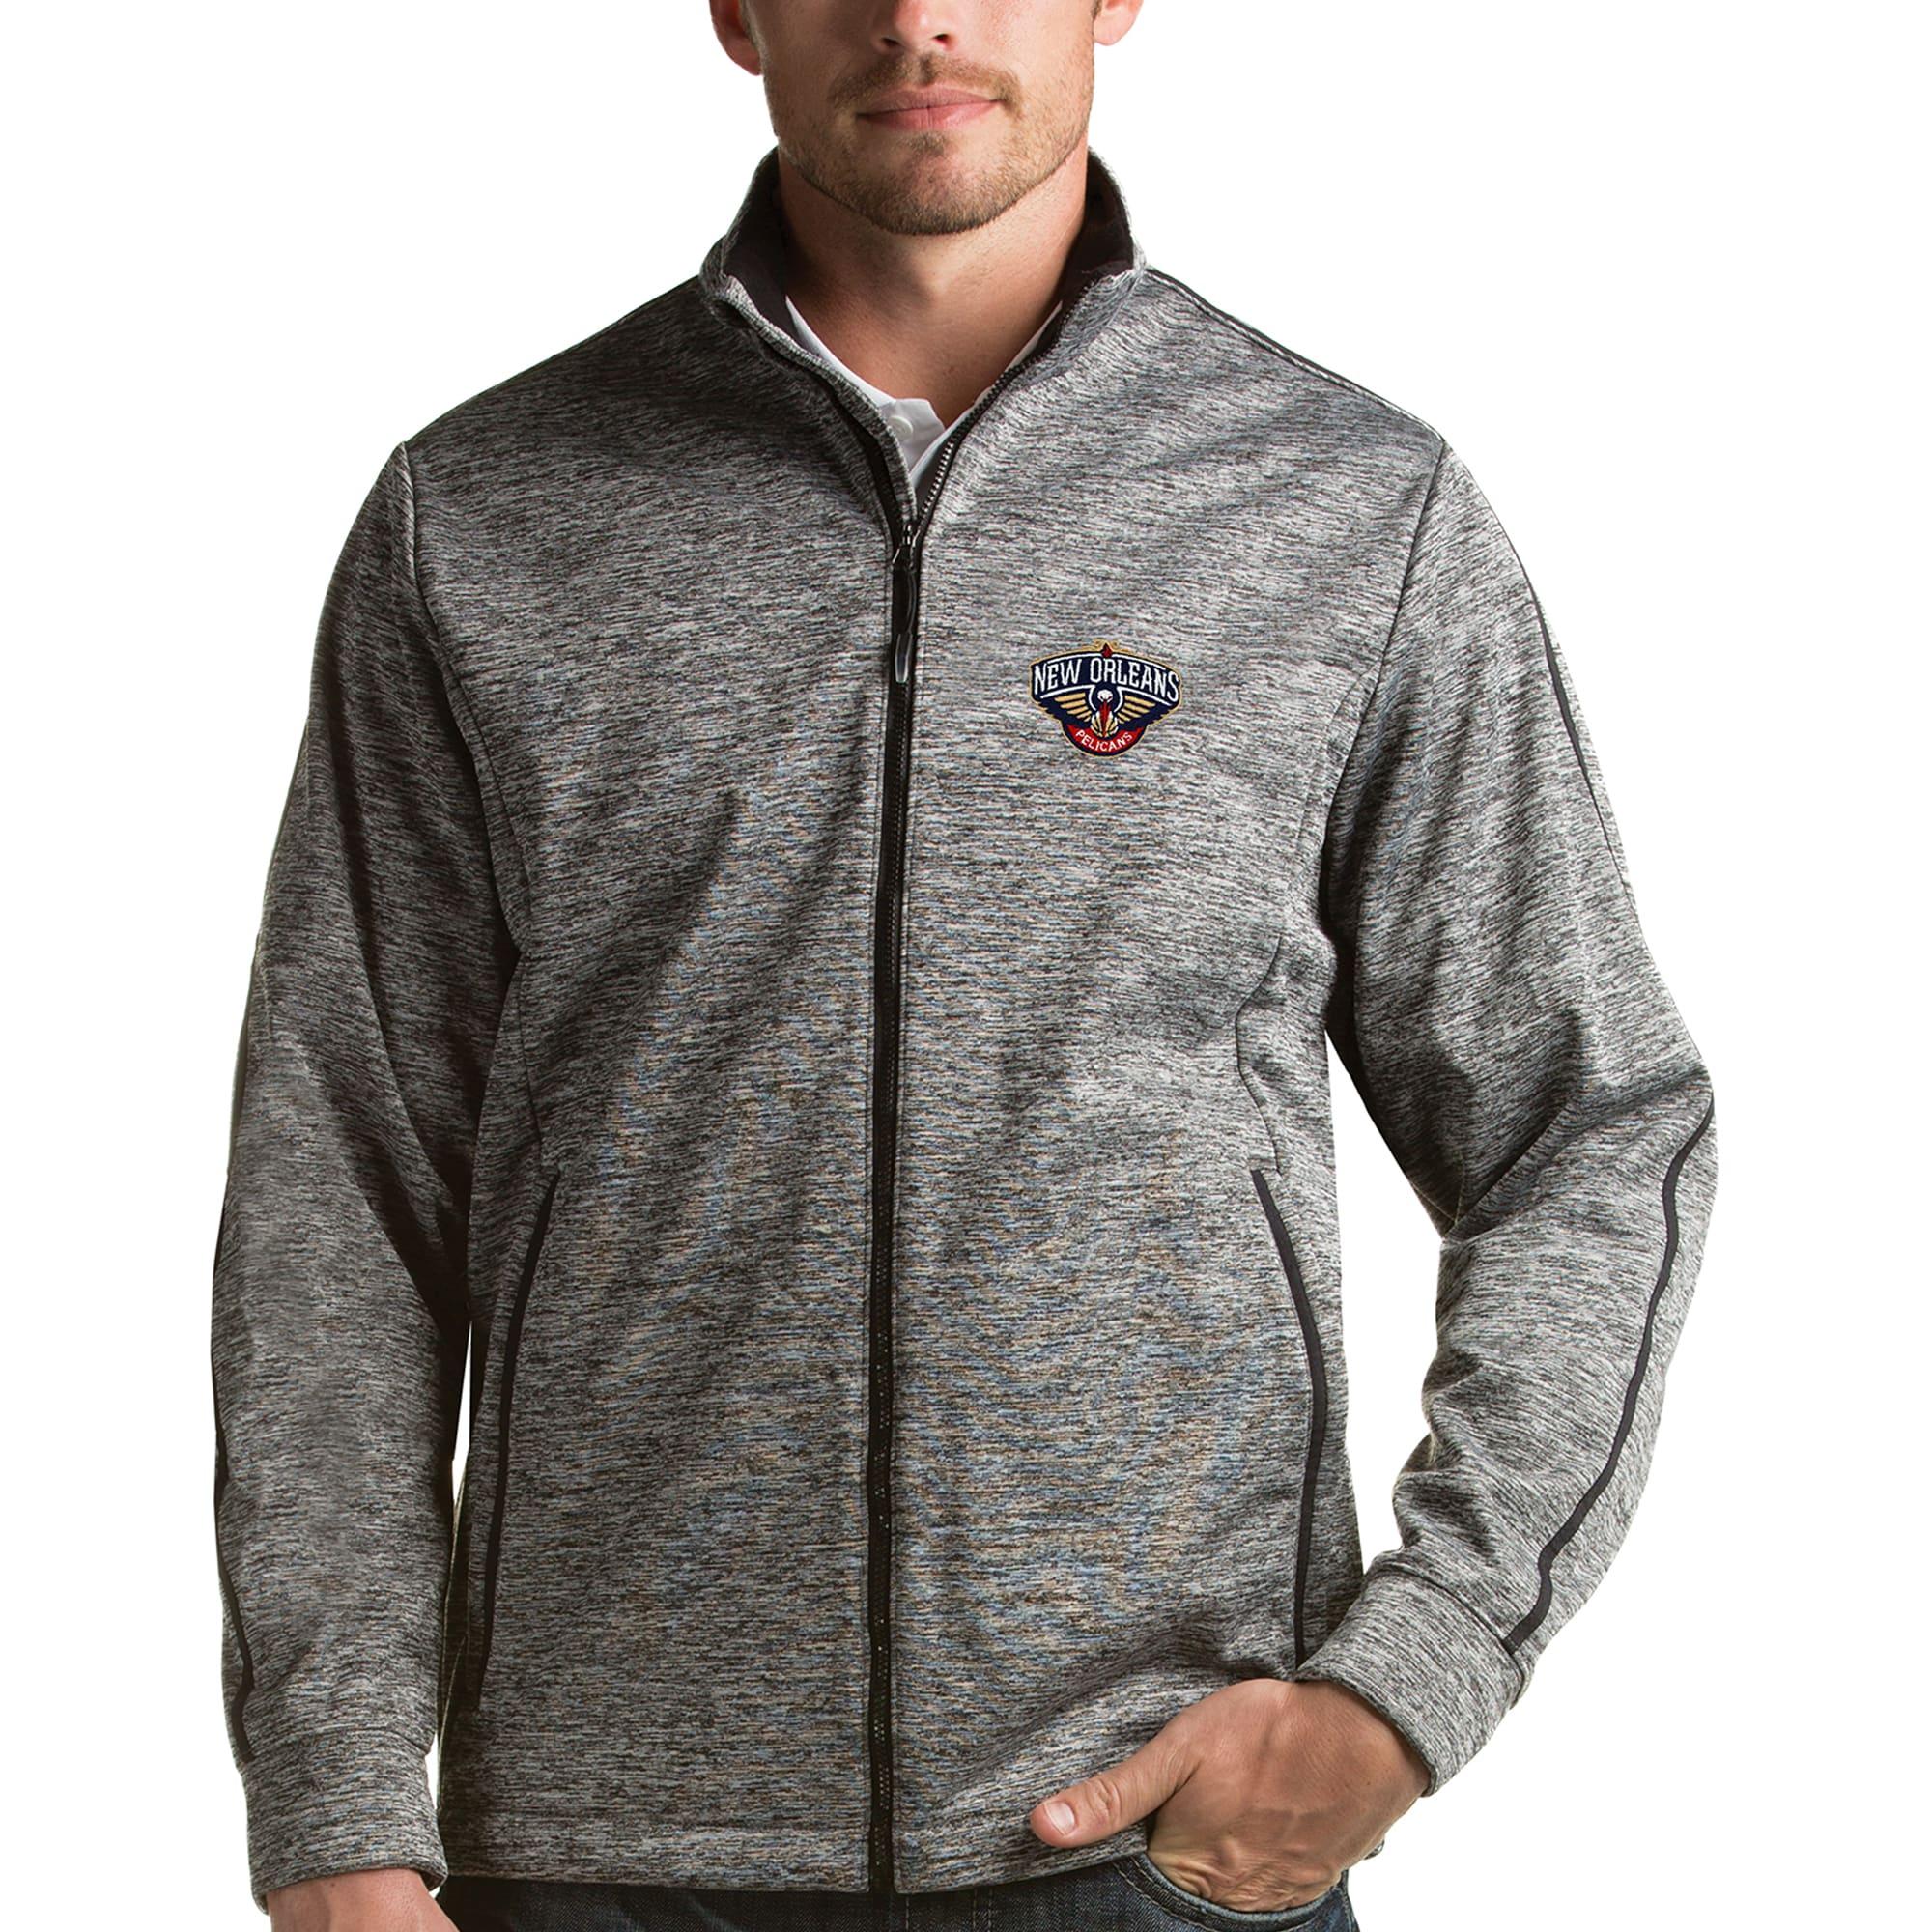 New Orleans Pelicans Antigua Golf Full-Zip Jacket - Heather Gray